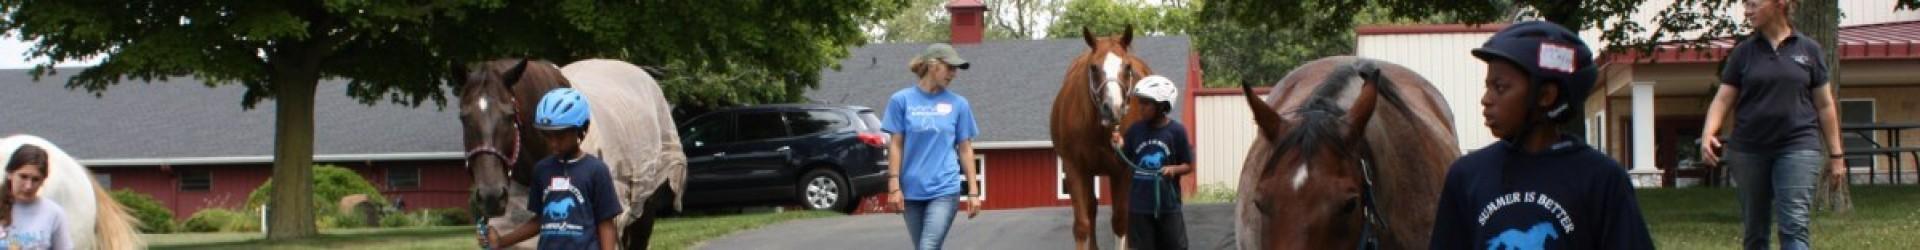 Header - Horses